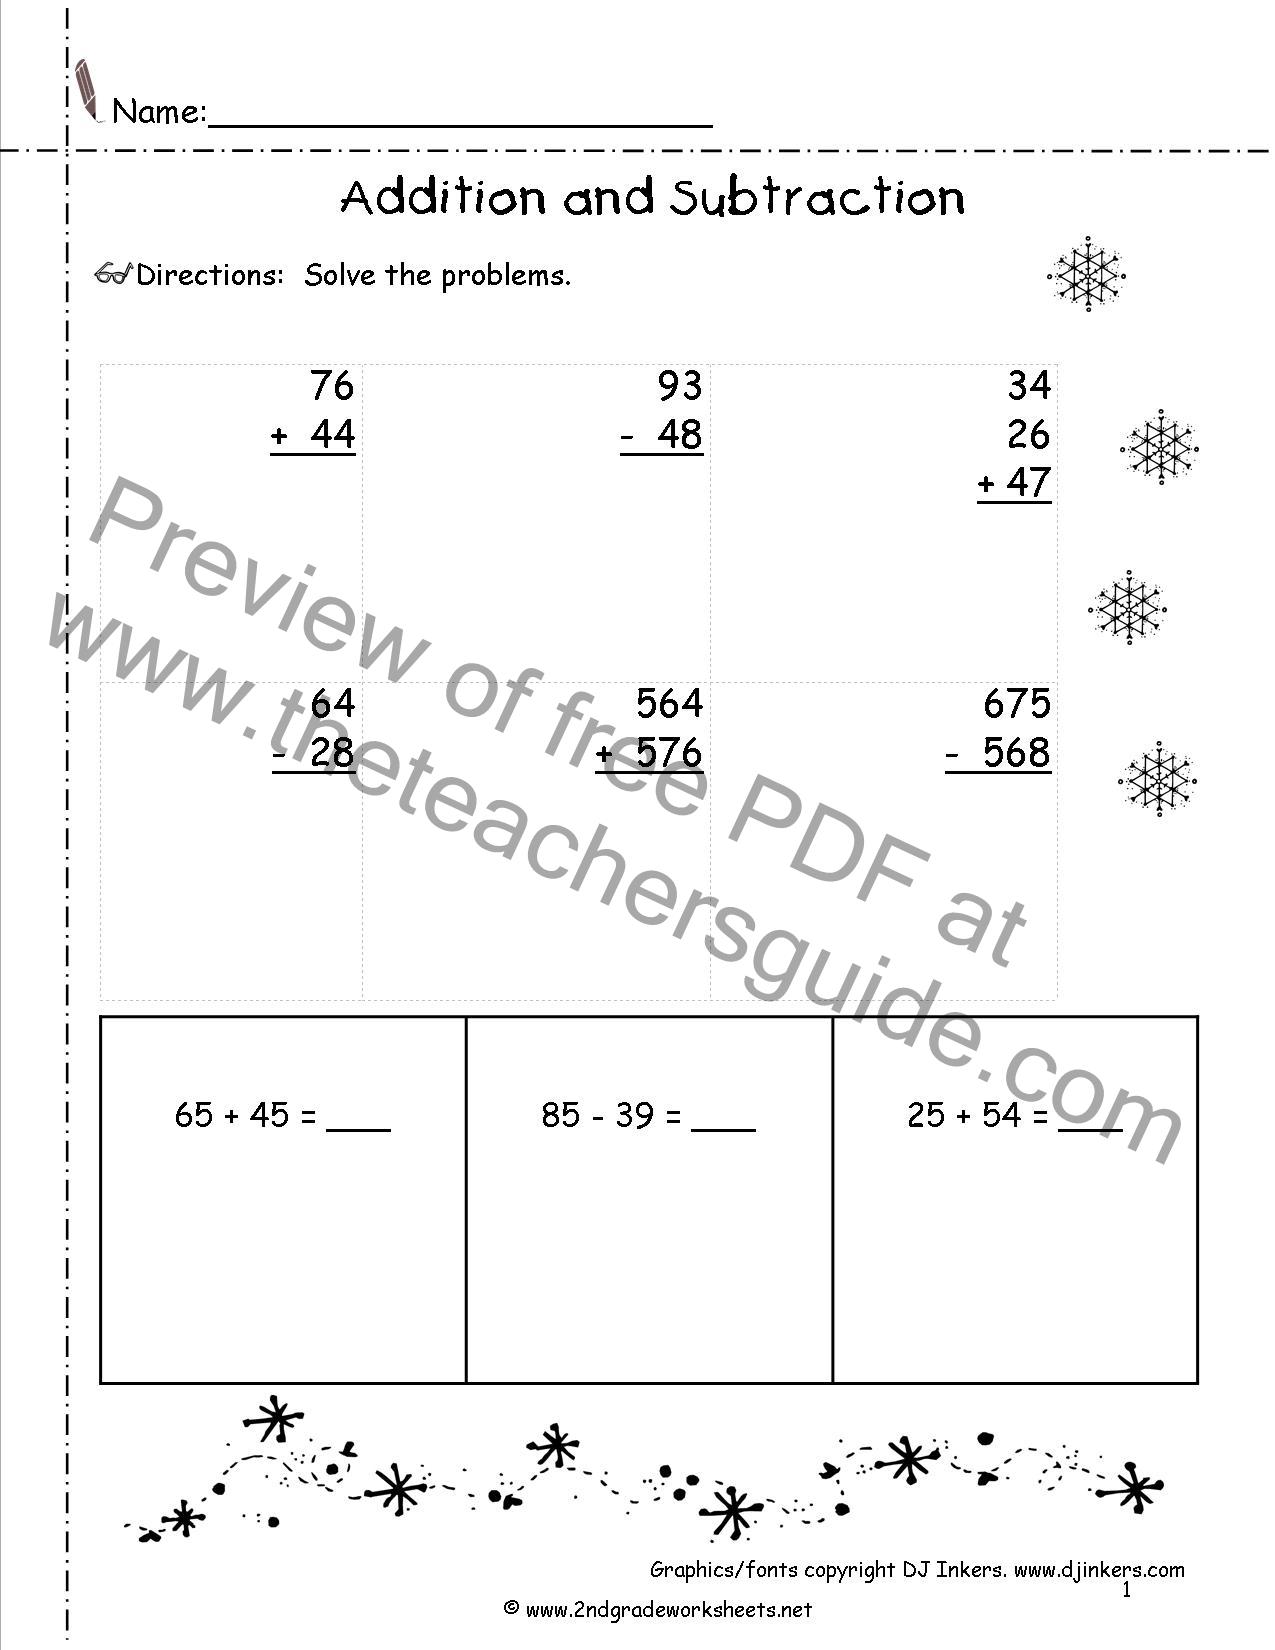 Winter Lesson Plans Themes Printouts Crafts